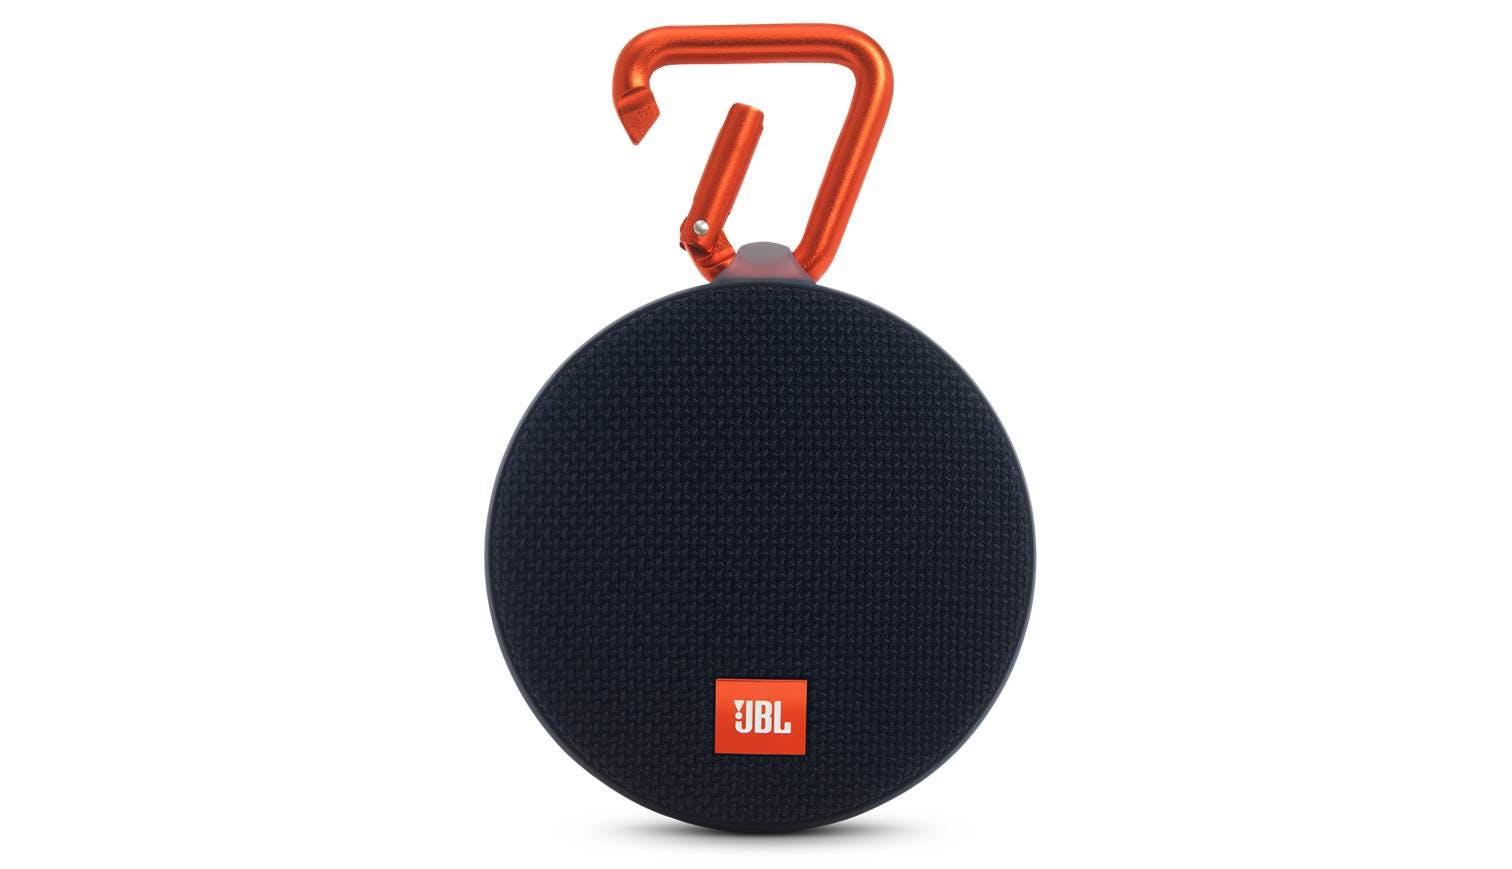 jbl clip ii portable bluetooth speaker black harvey norman singapore. Black Bedroom Furniture Sets. Home Design Ideas